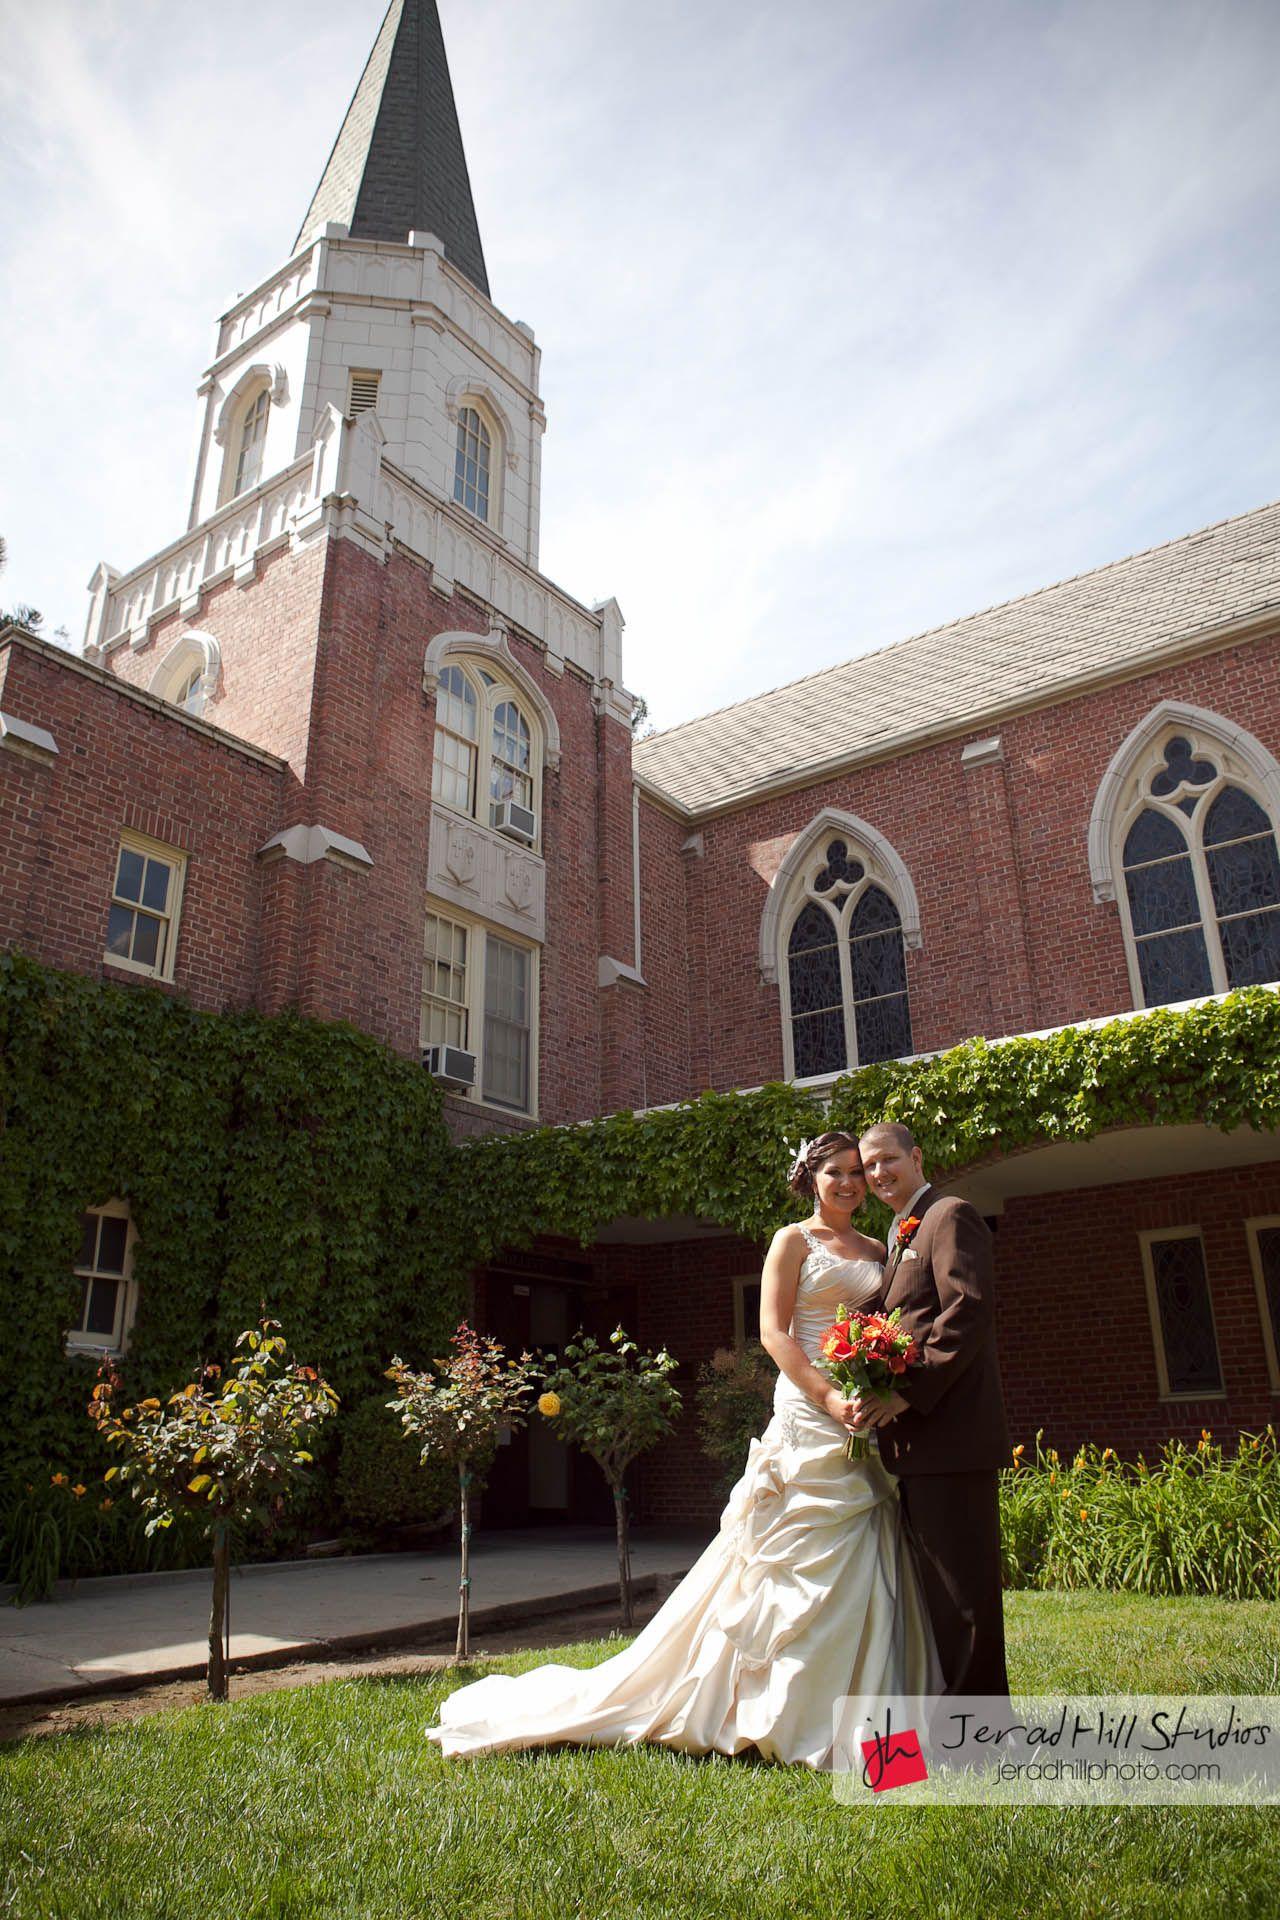 Morris Chapel Wedding In Stockton California Photo By Jerad Hill